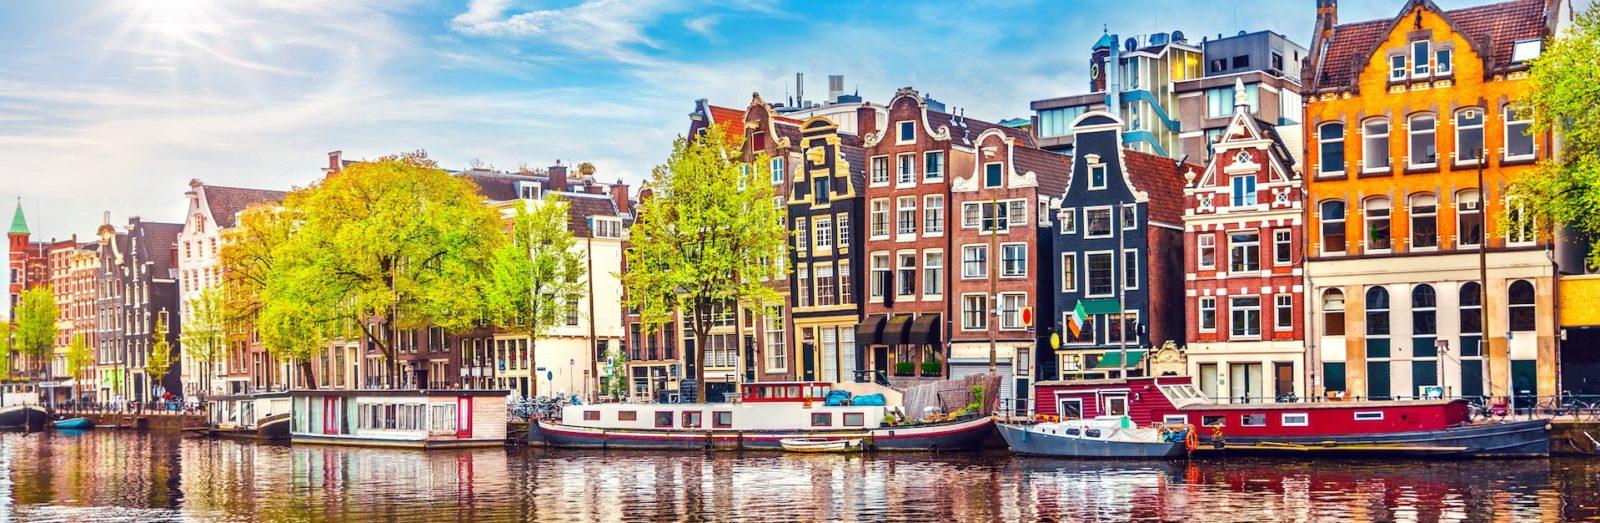 amsterdam-1600x523.jpg